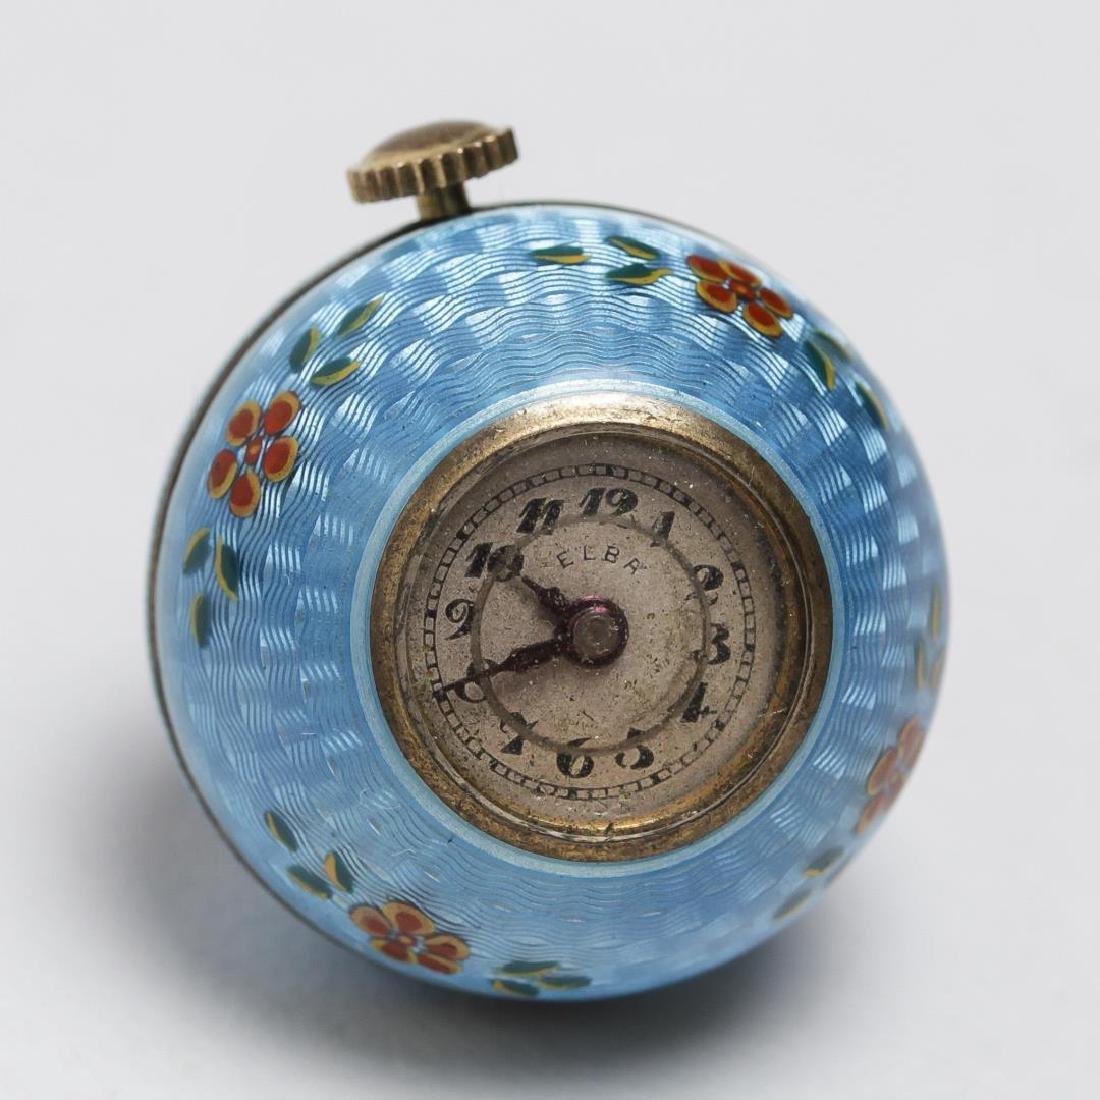 Guilloche Silver Pendant Watch, Spherical, Swiss